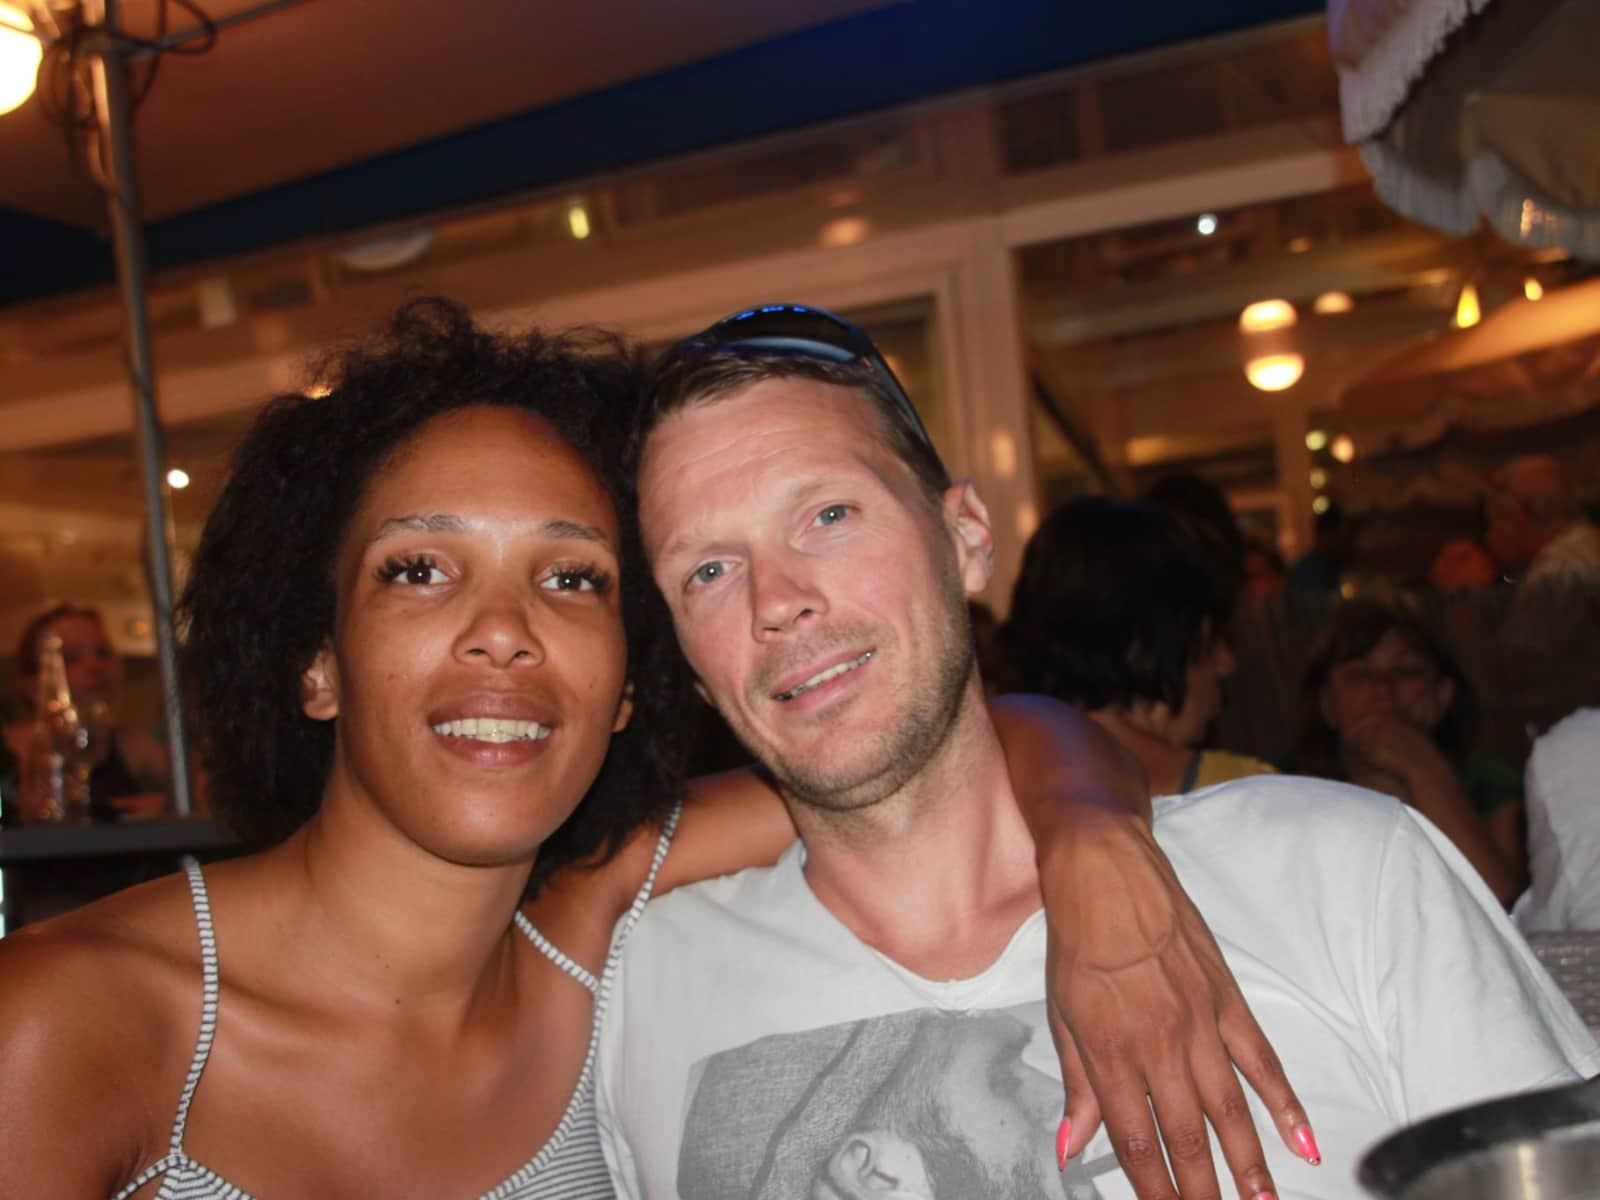 Jouri & Jenny from Hasselt, Belgium